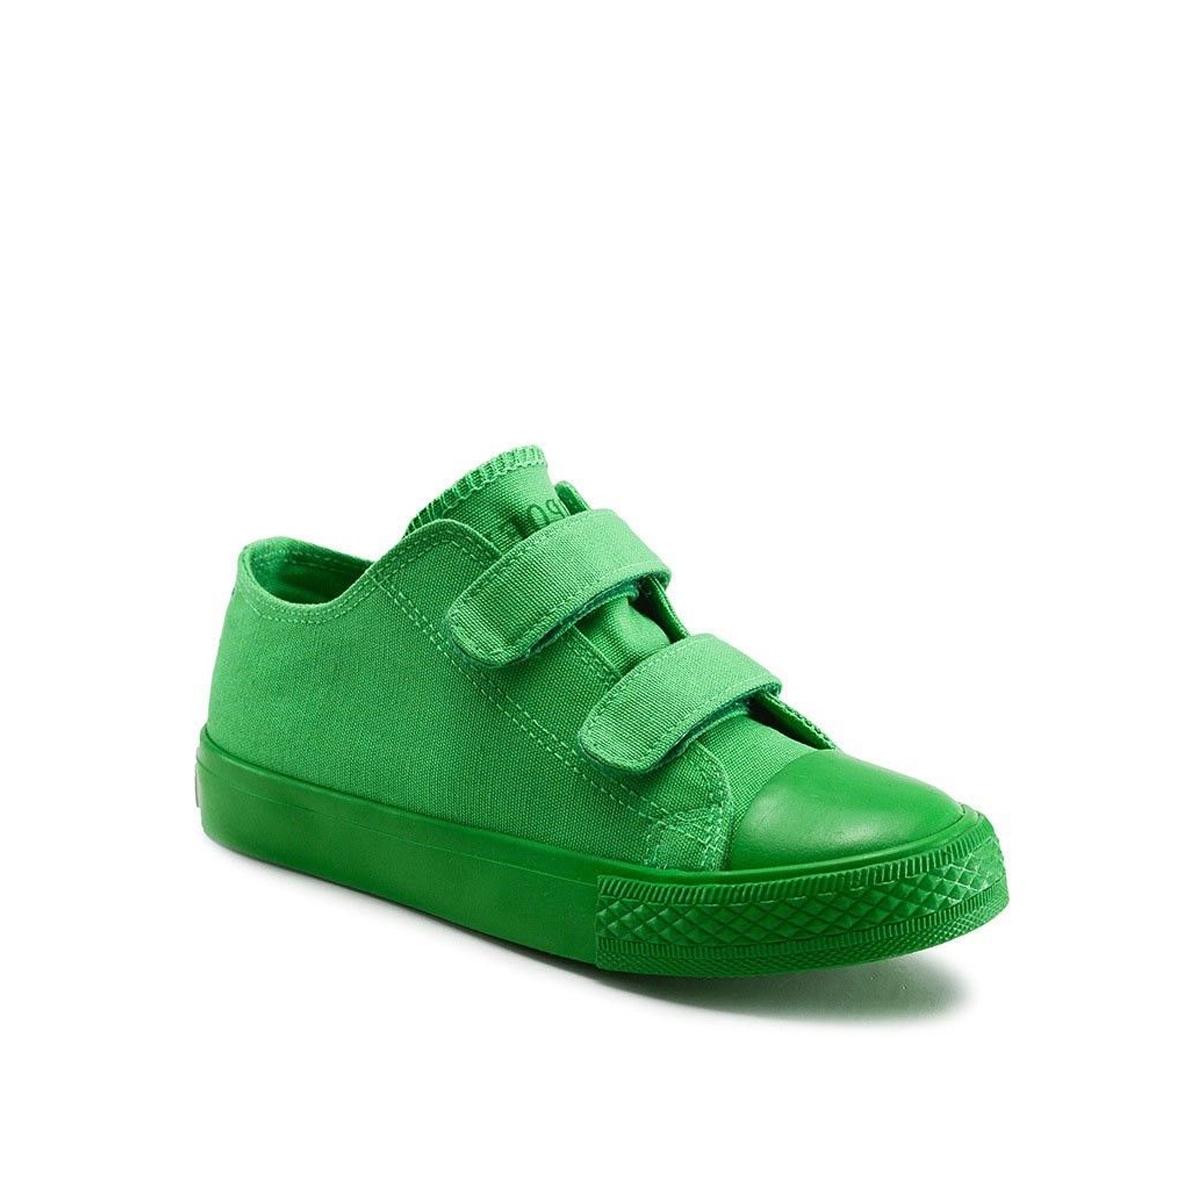 efb52b1da9d3d Bebe baby shoes